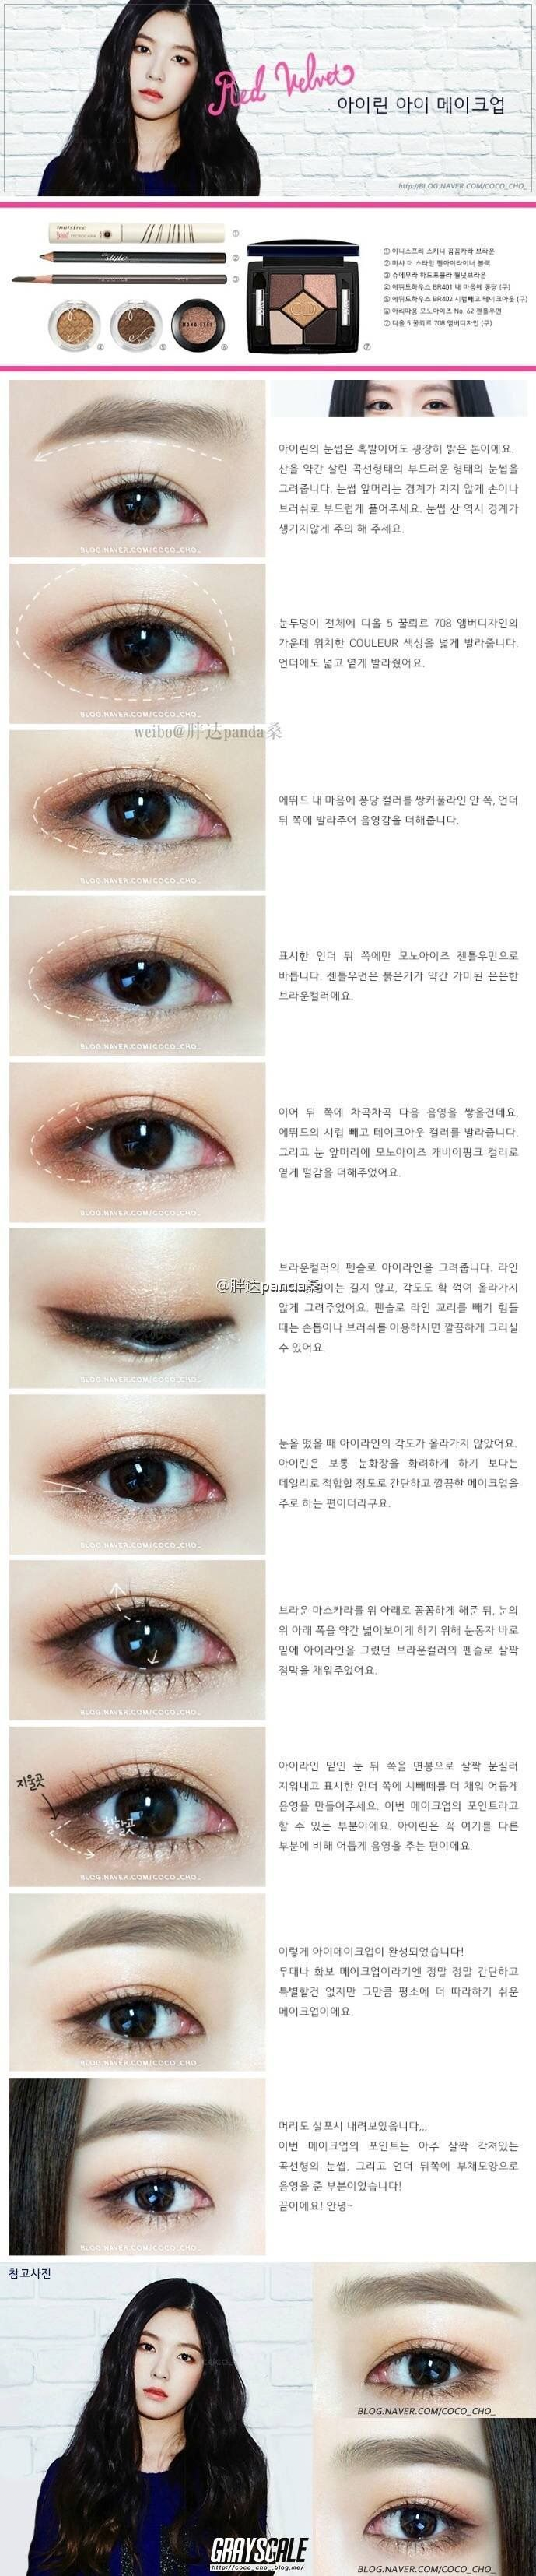 Red Velvet Irene Be Natural Korean Kpop Idol Makeup Tutorial Cr Coco Cho Blog Me Peinadosasiaticos Ulzzang Makeup Asian Eye Makeup Korean Eye Makeup